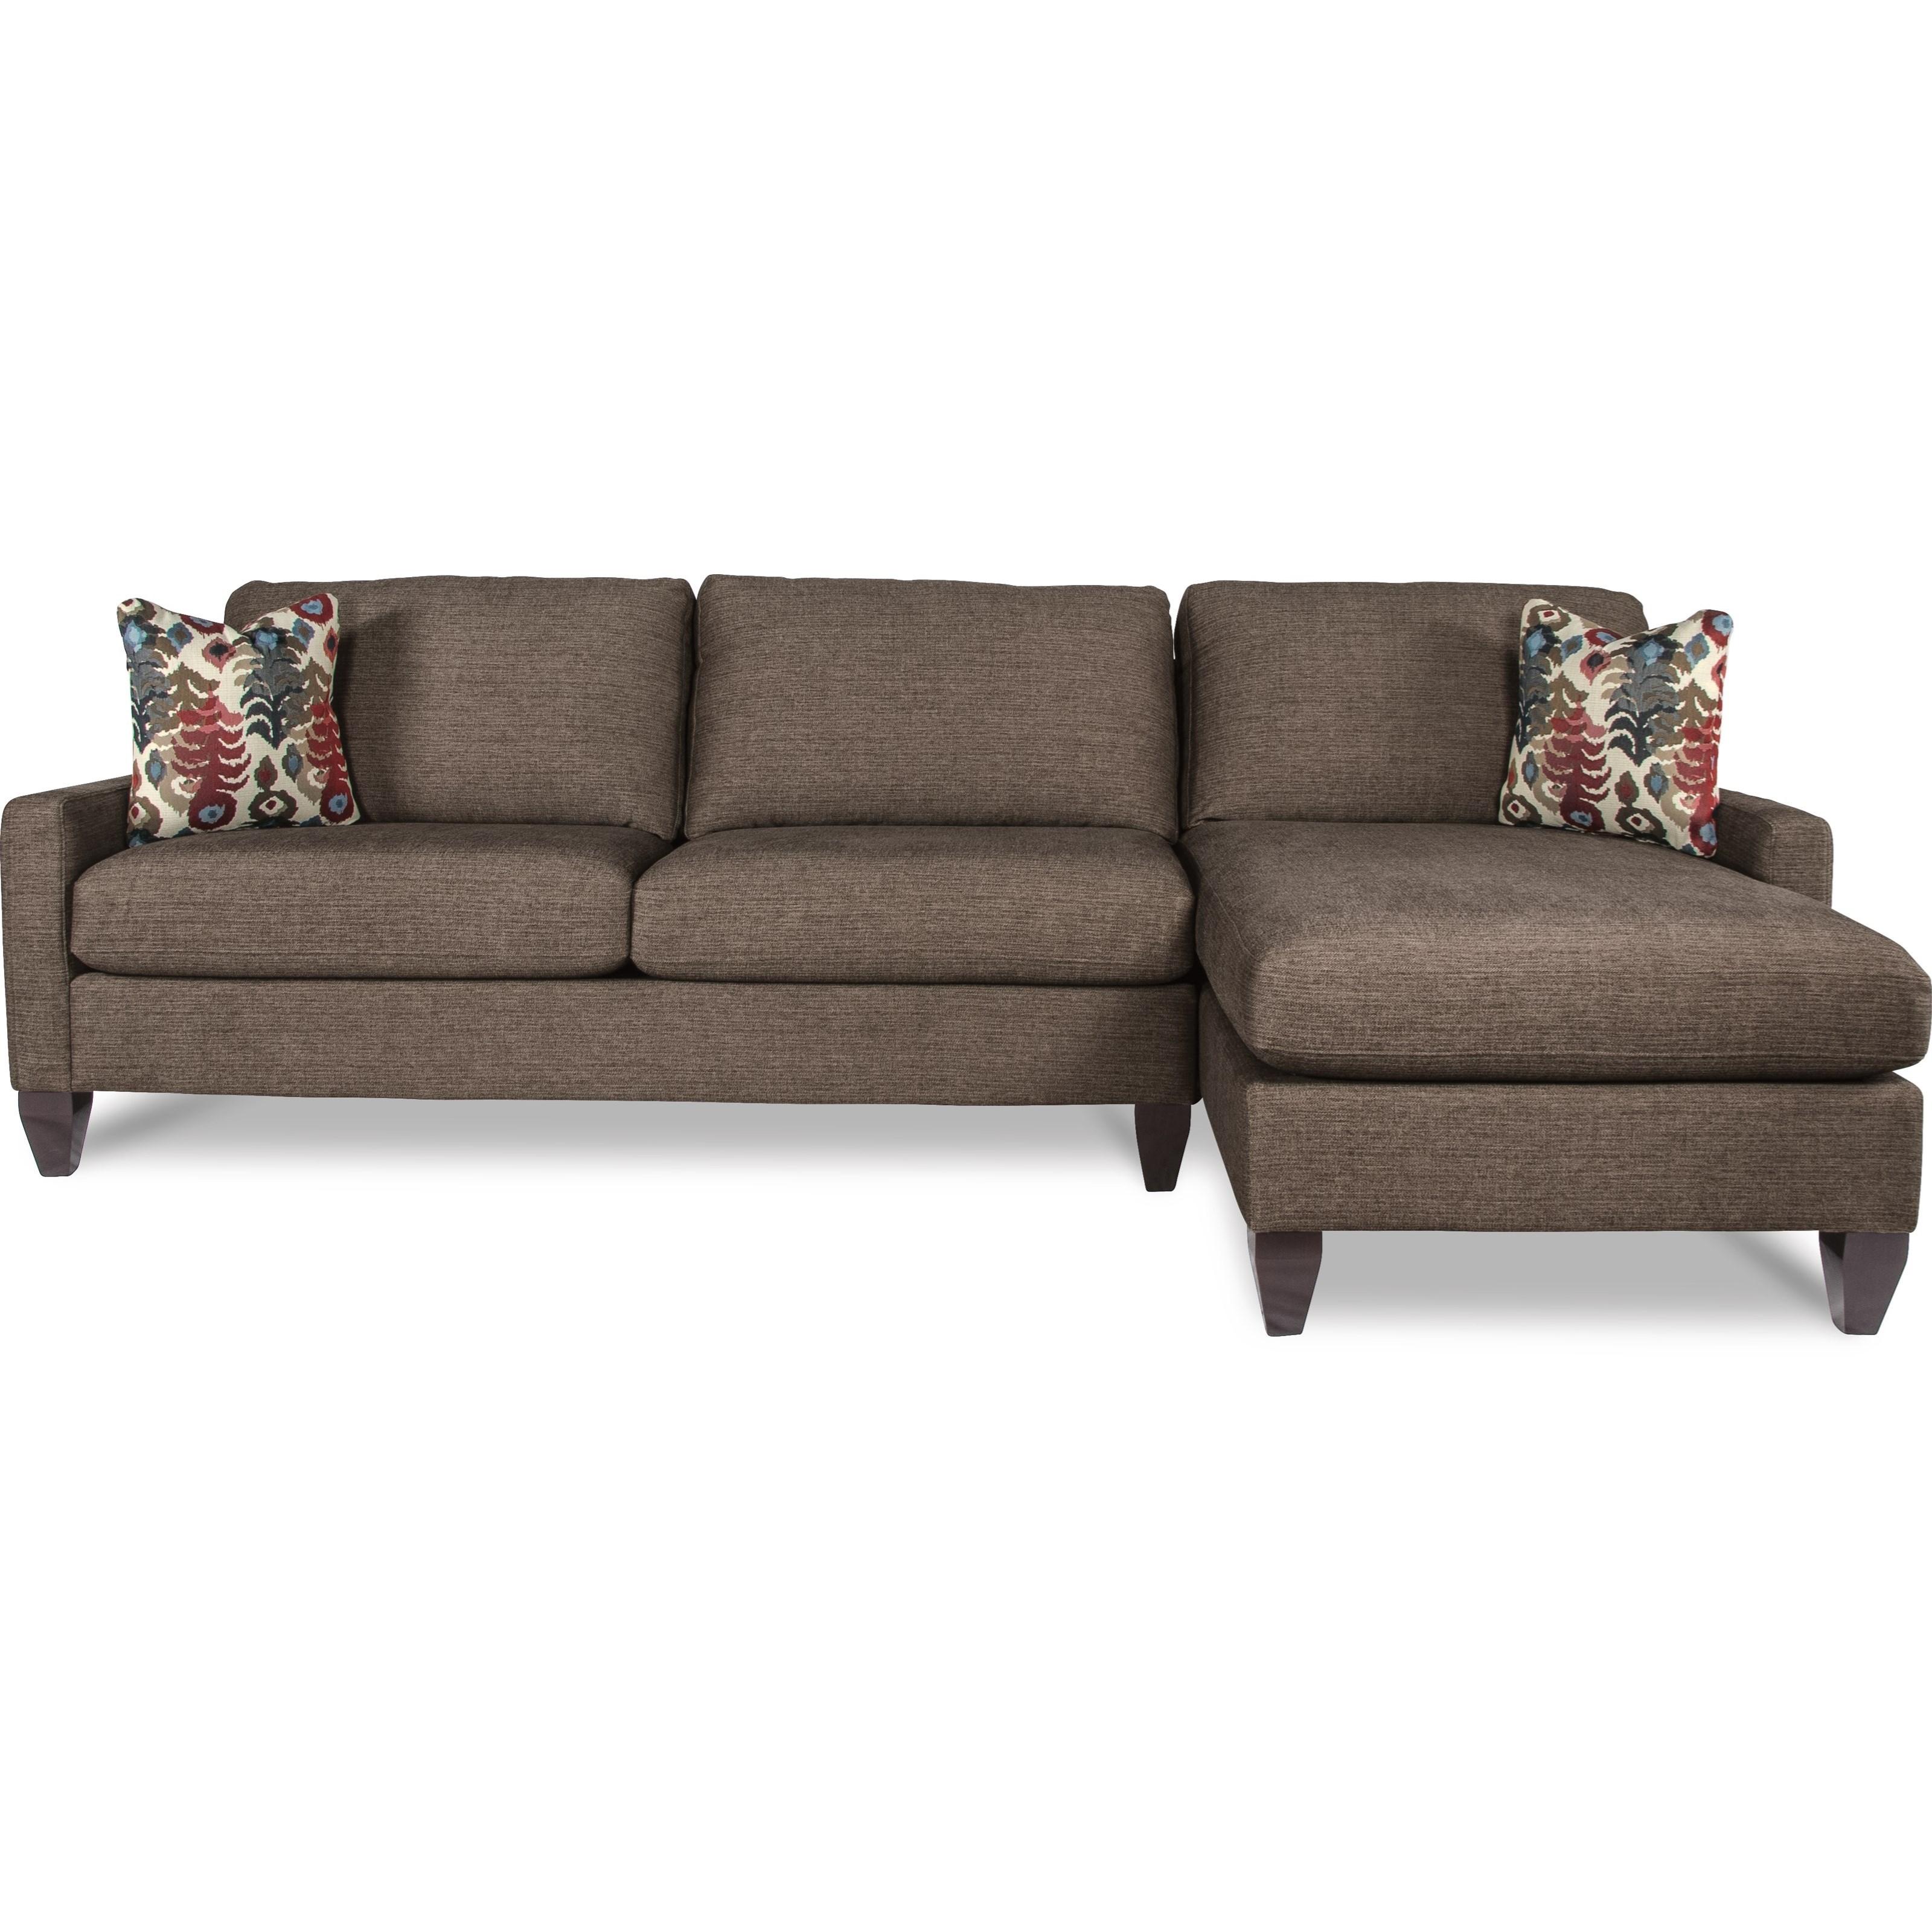 la z boy studio contemporary two piece sectional sofa w raf chaise rh morrisathome com Cuddle Circle Lounge with Chaise Corduroy Furniture La Z Boy Recliner Springs